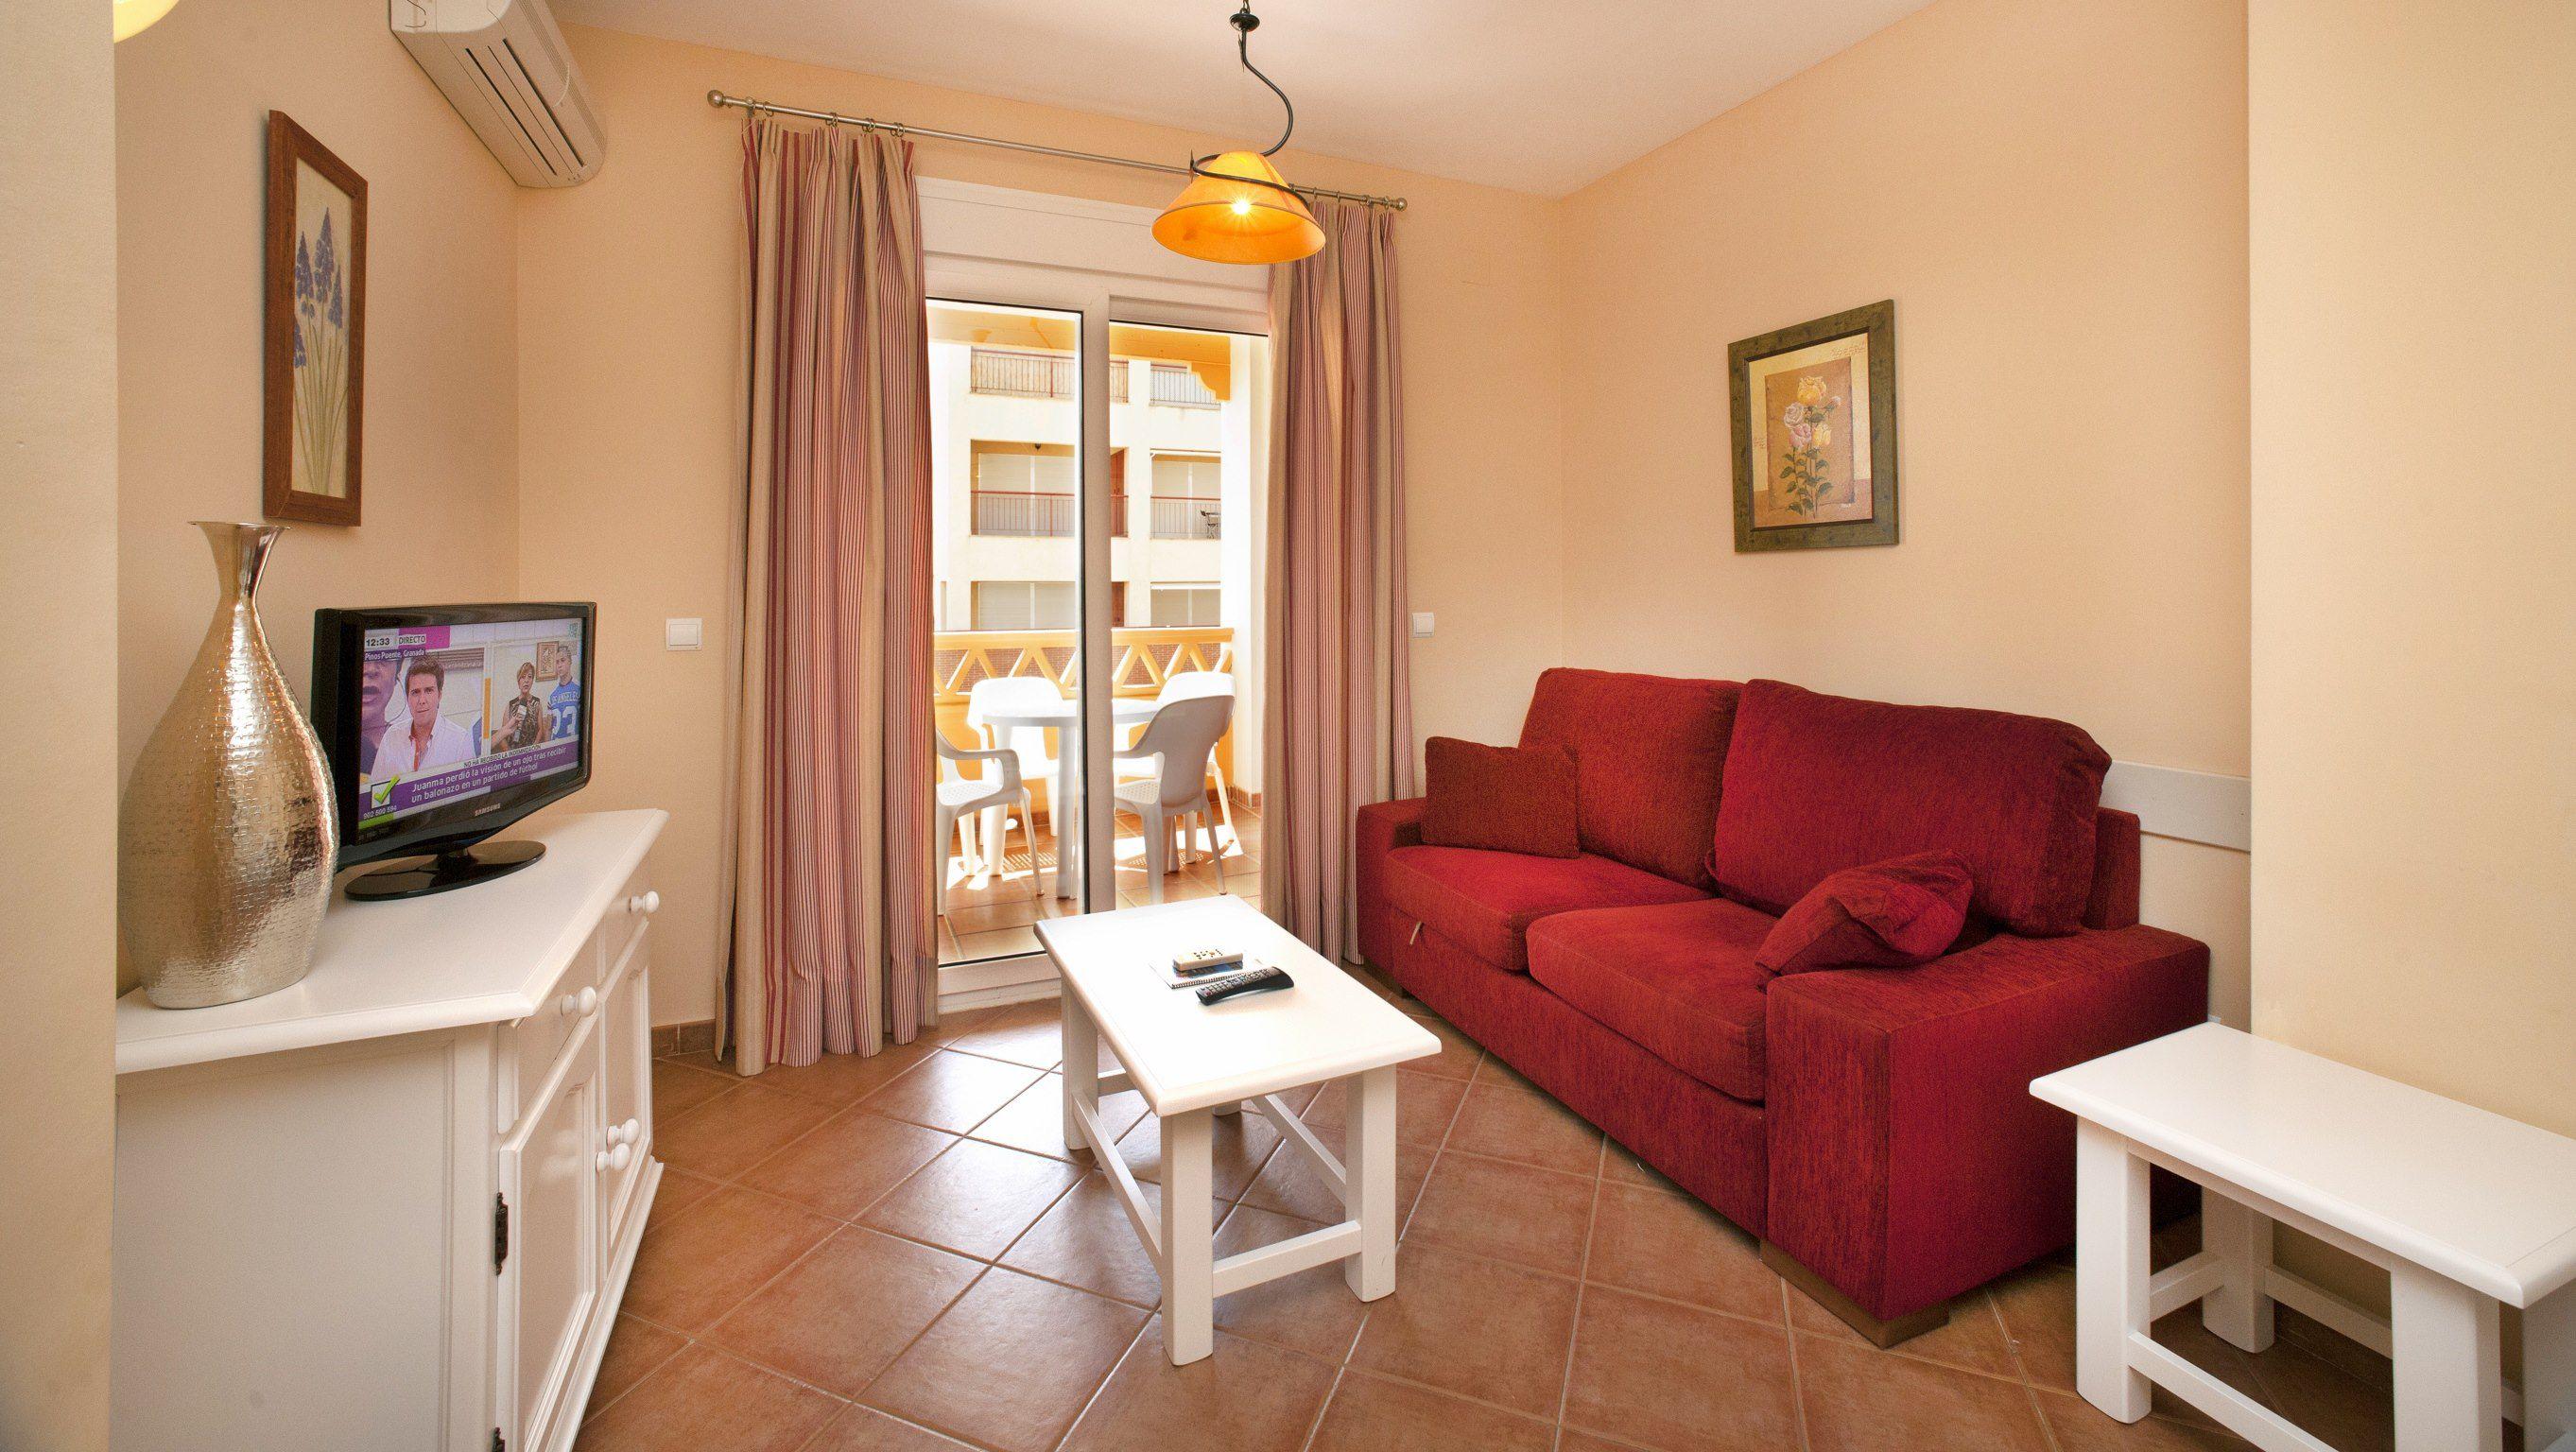 Apartamento 1 dormitorio  del hotel Leo Canela. Foto 3